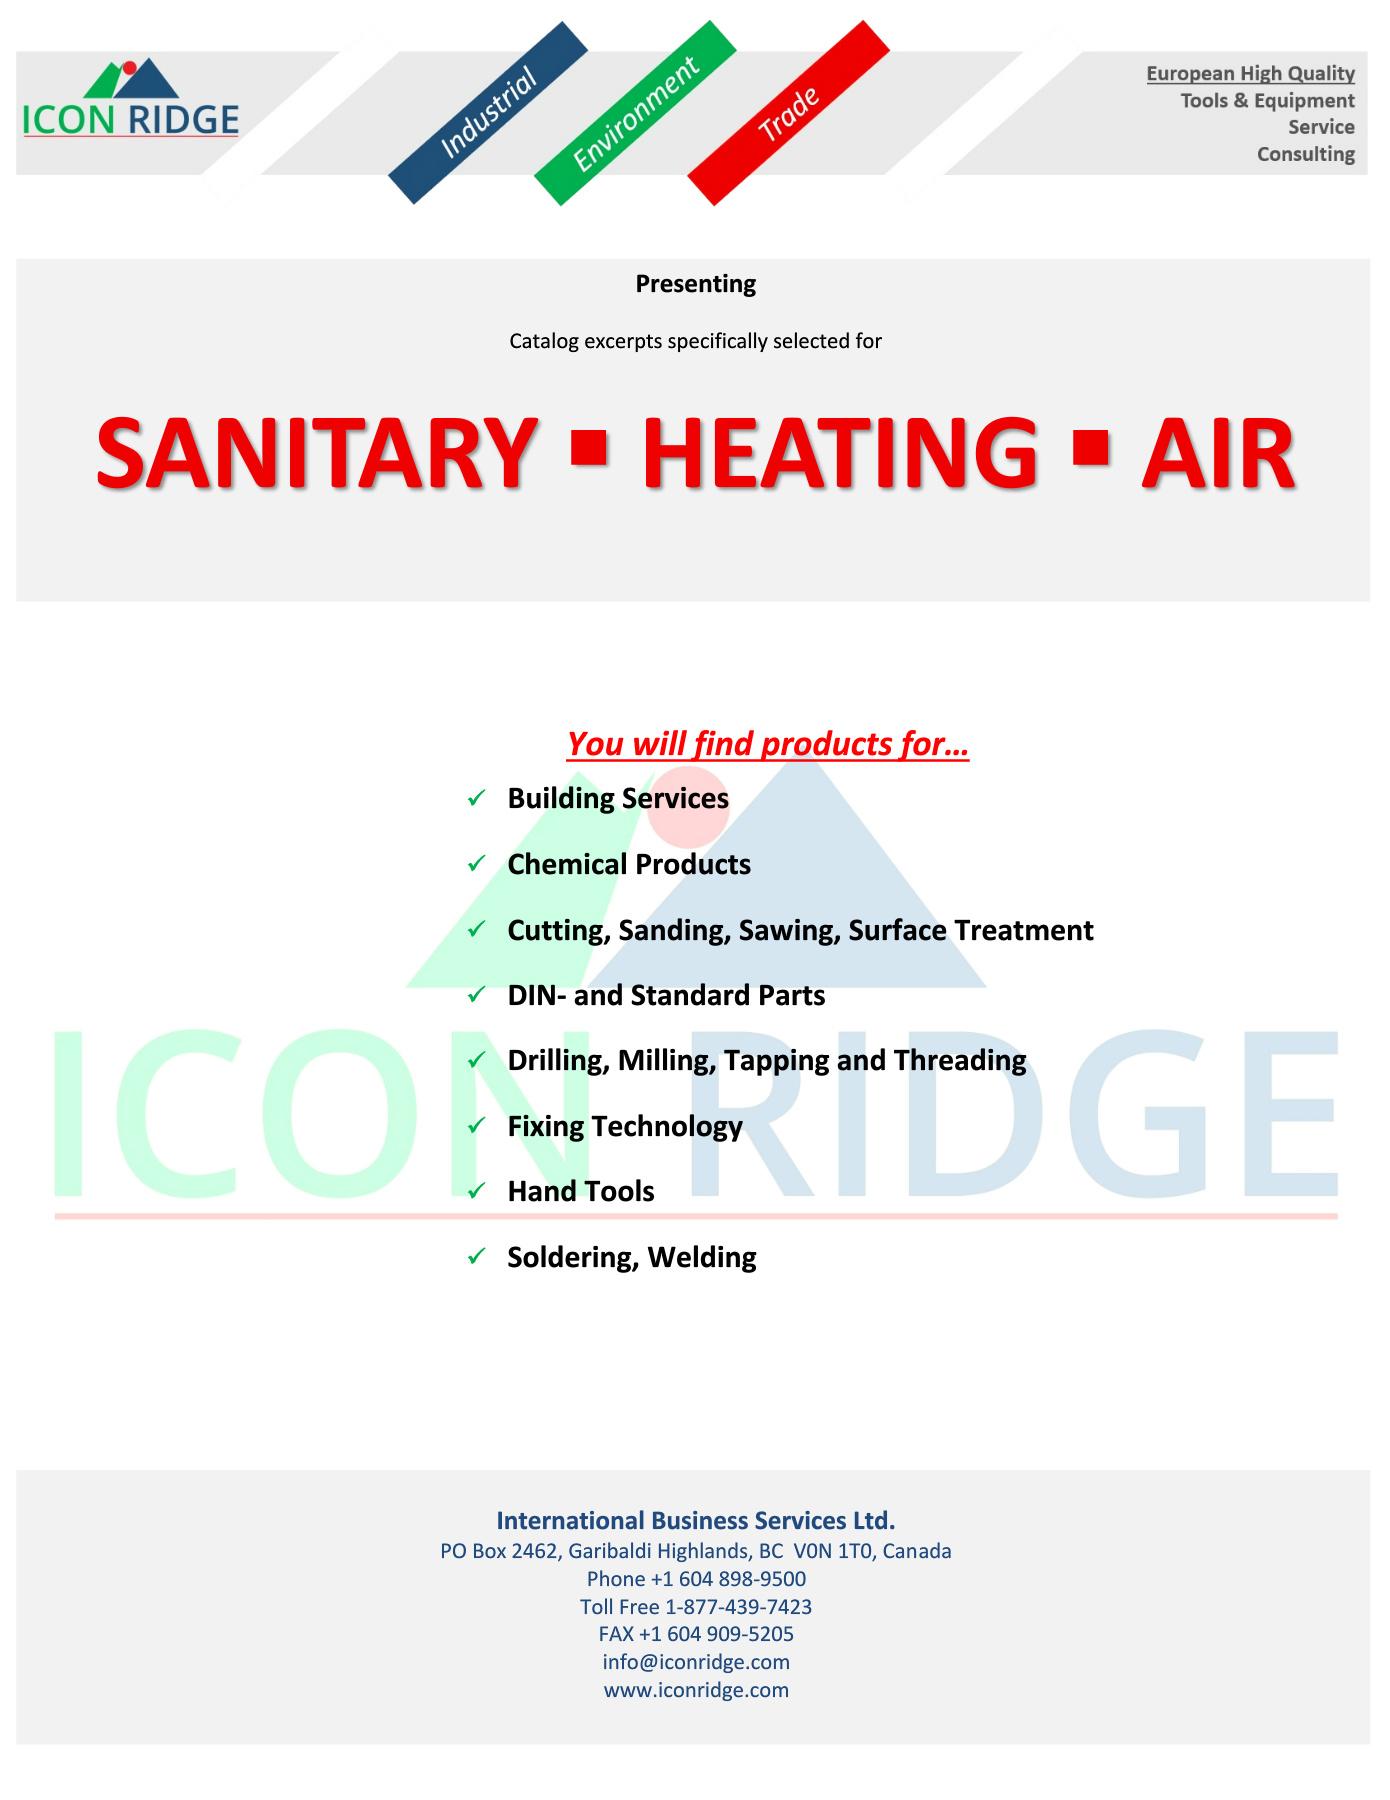 Icon Ridge SANITARY-HEATING-AIR Catalog